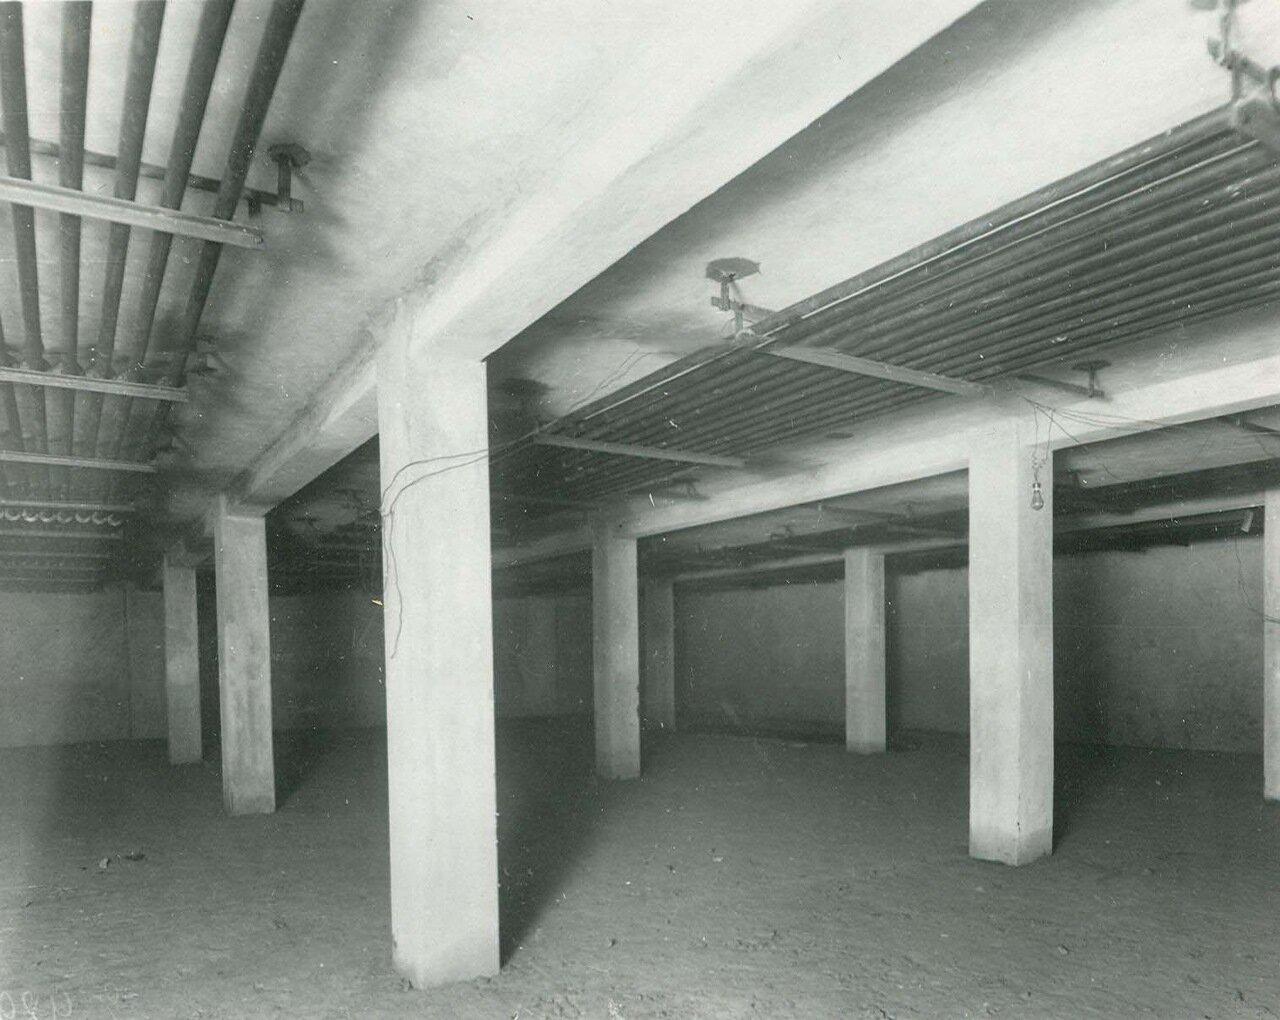 11. Образец железо-бетонных перекрытий